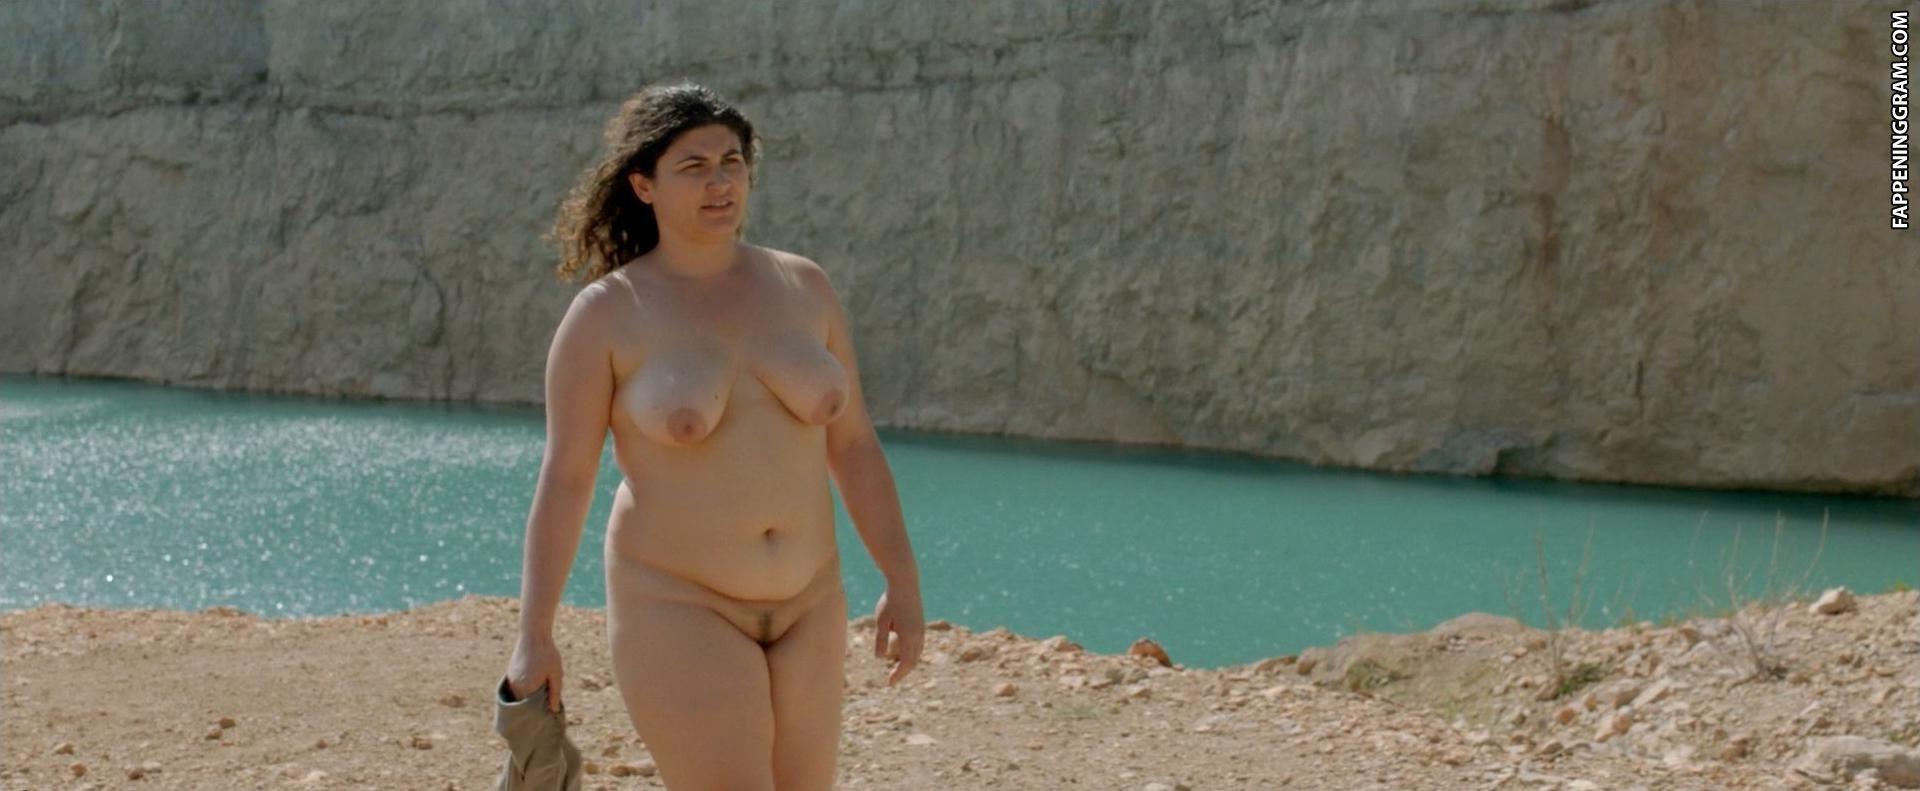 Thelma Tixou  nackt